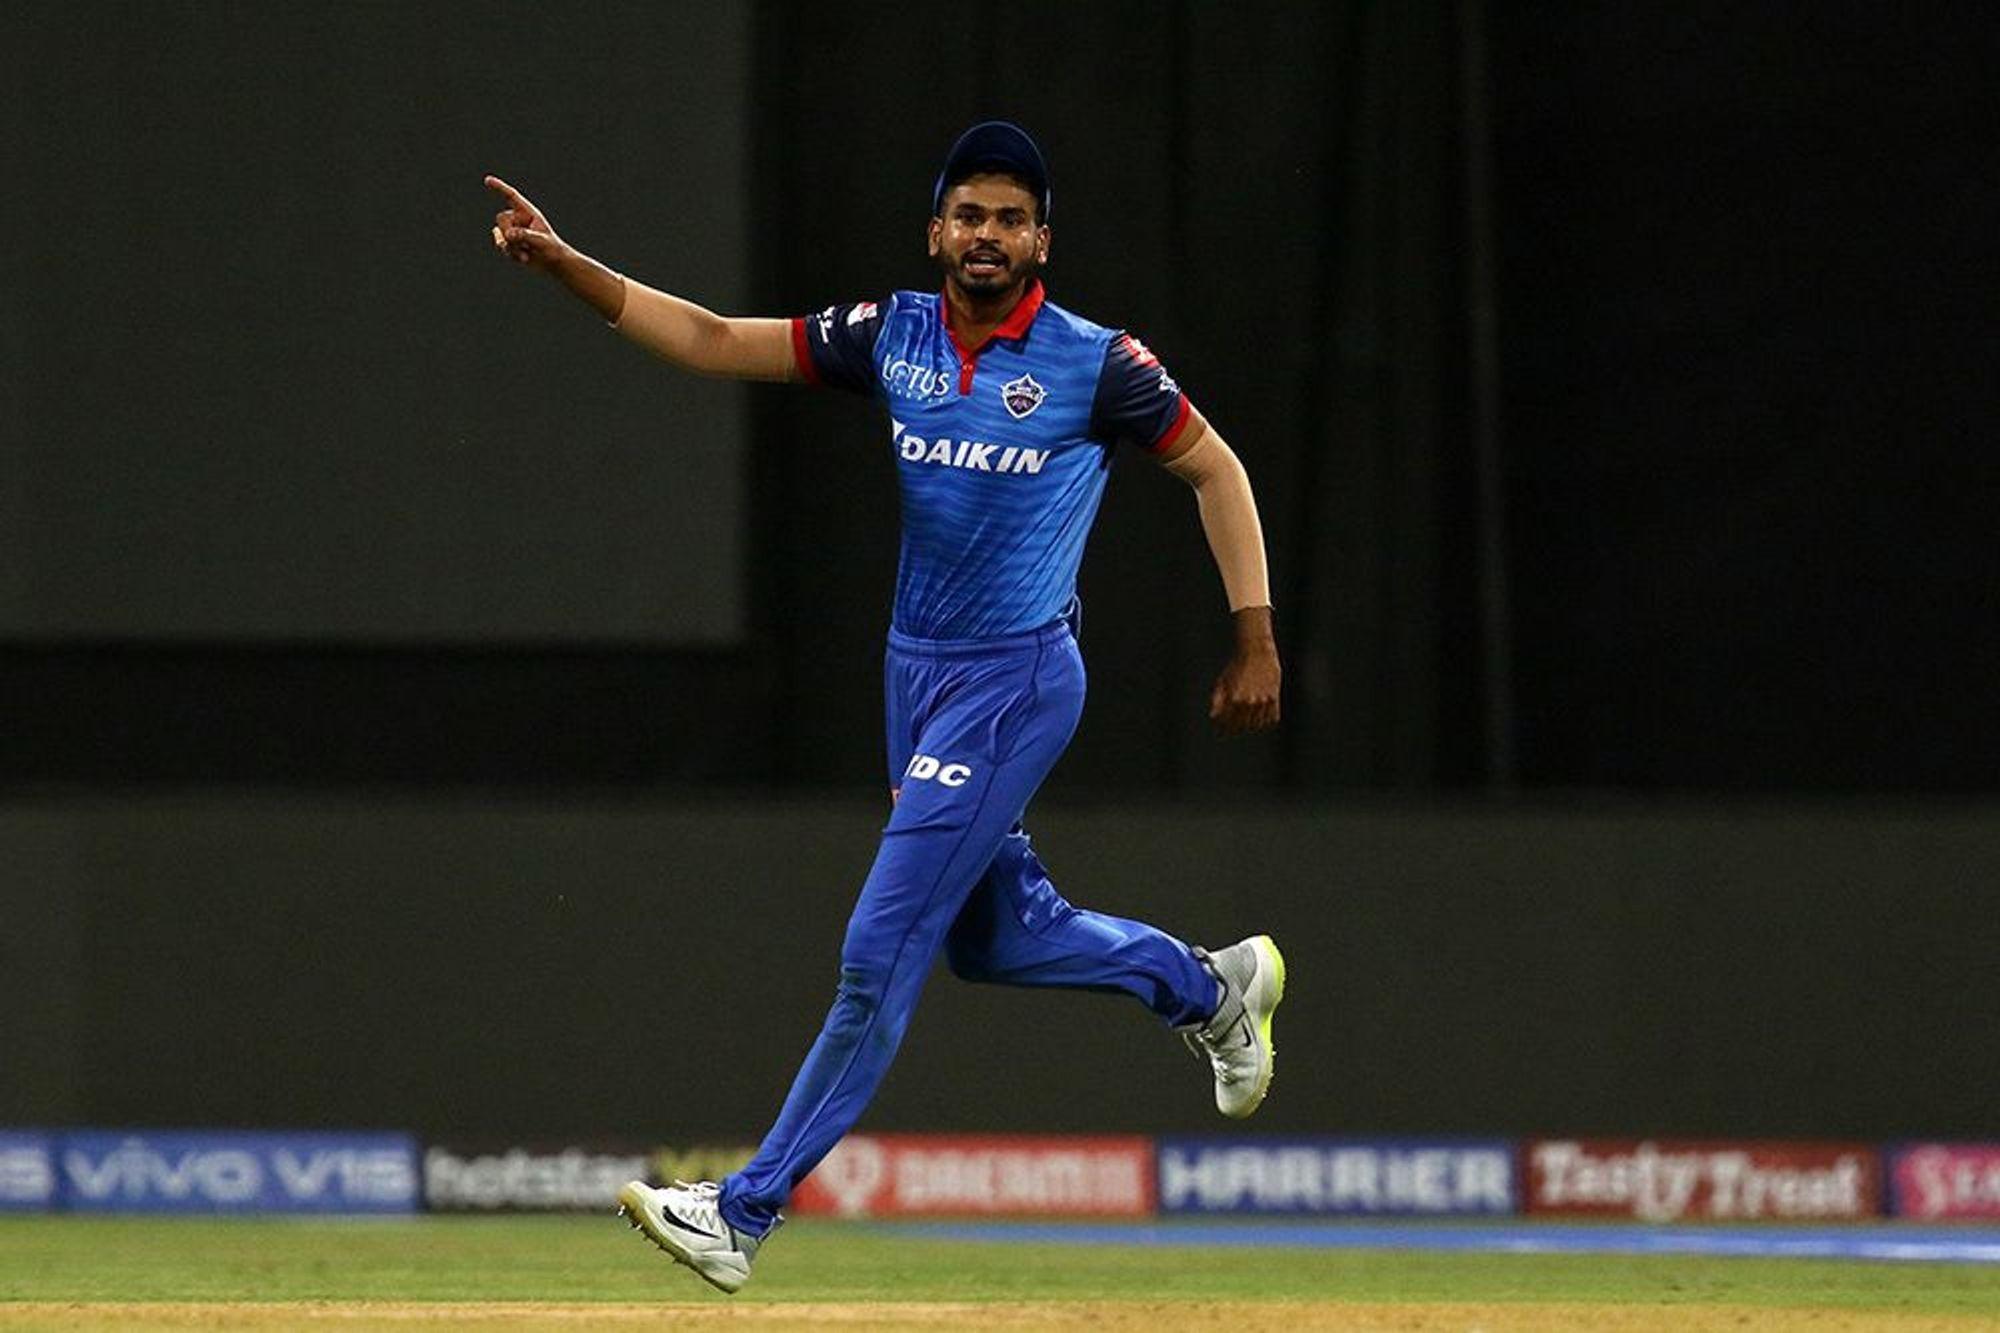 IPL 2019 Chennai super kings, Ipl, Mumbai indians